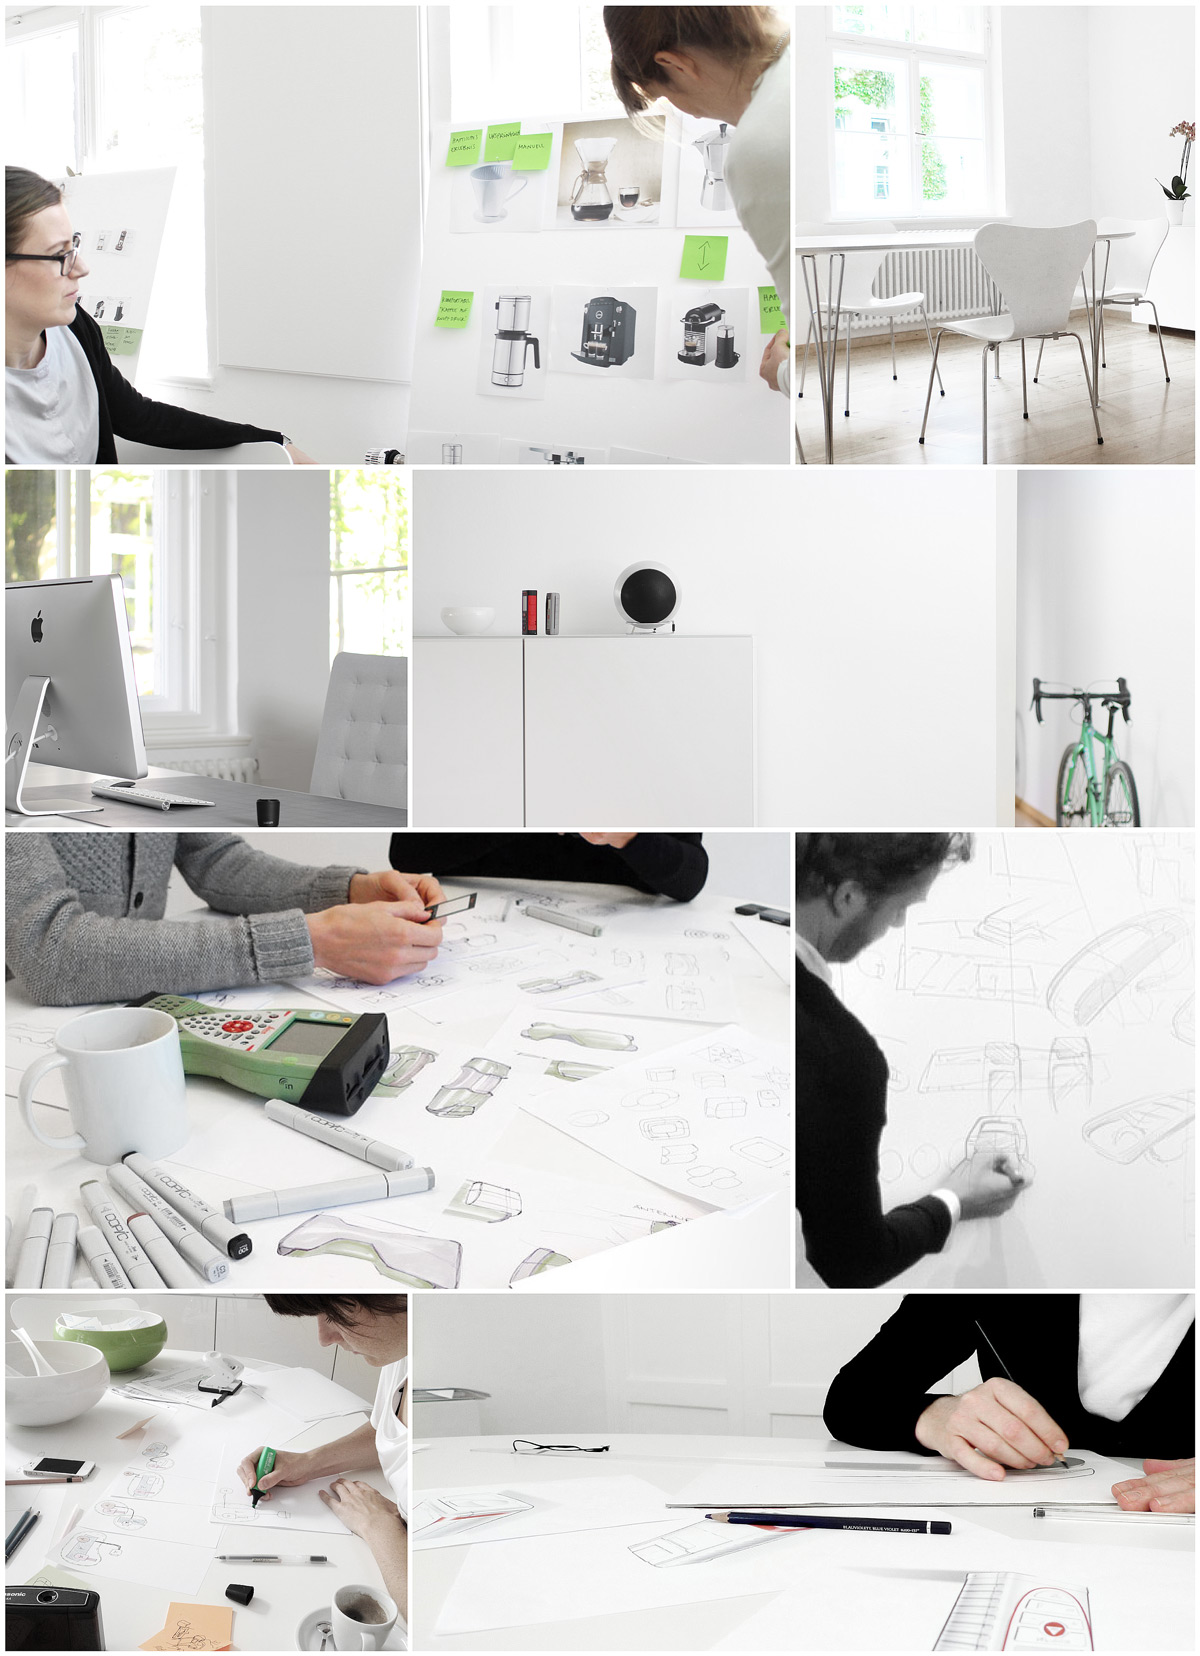 Industrial design Industriedesign | Produktdesign Agentur München | industrial design Studio | Büro | UX Design | Interface Budde Burkandt Design Industriedesign | Produktdesign Agentur München | Studio | Büro | UX Design | Interface